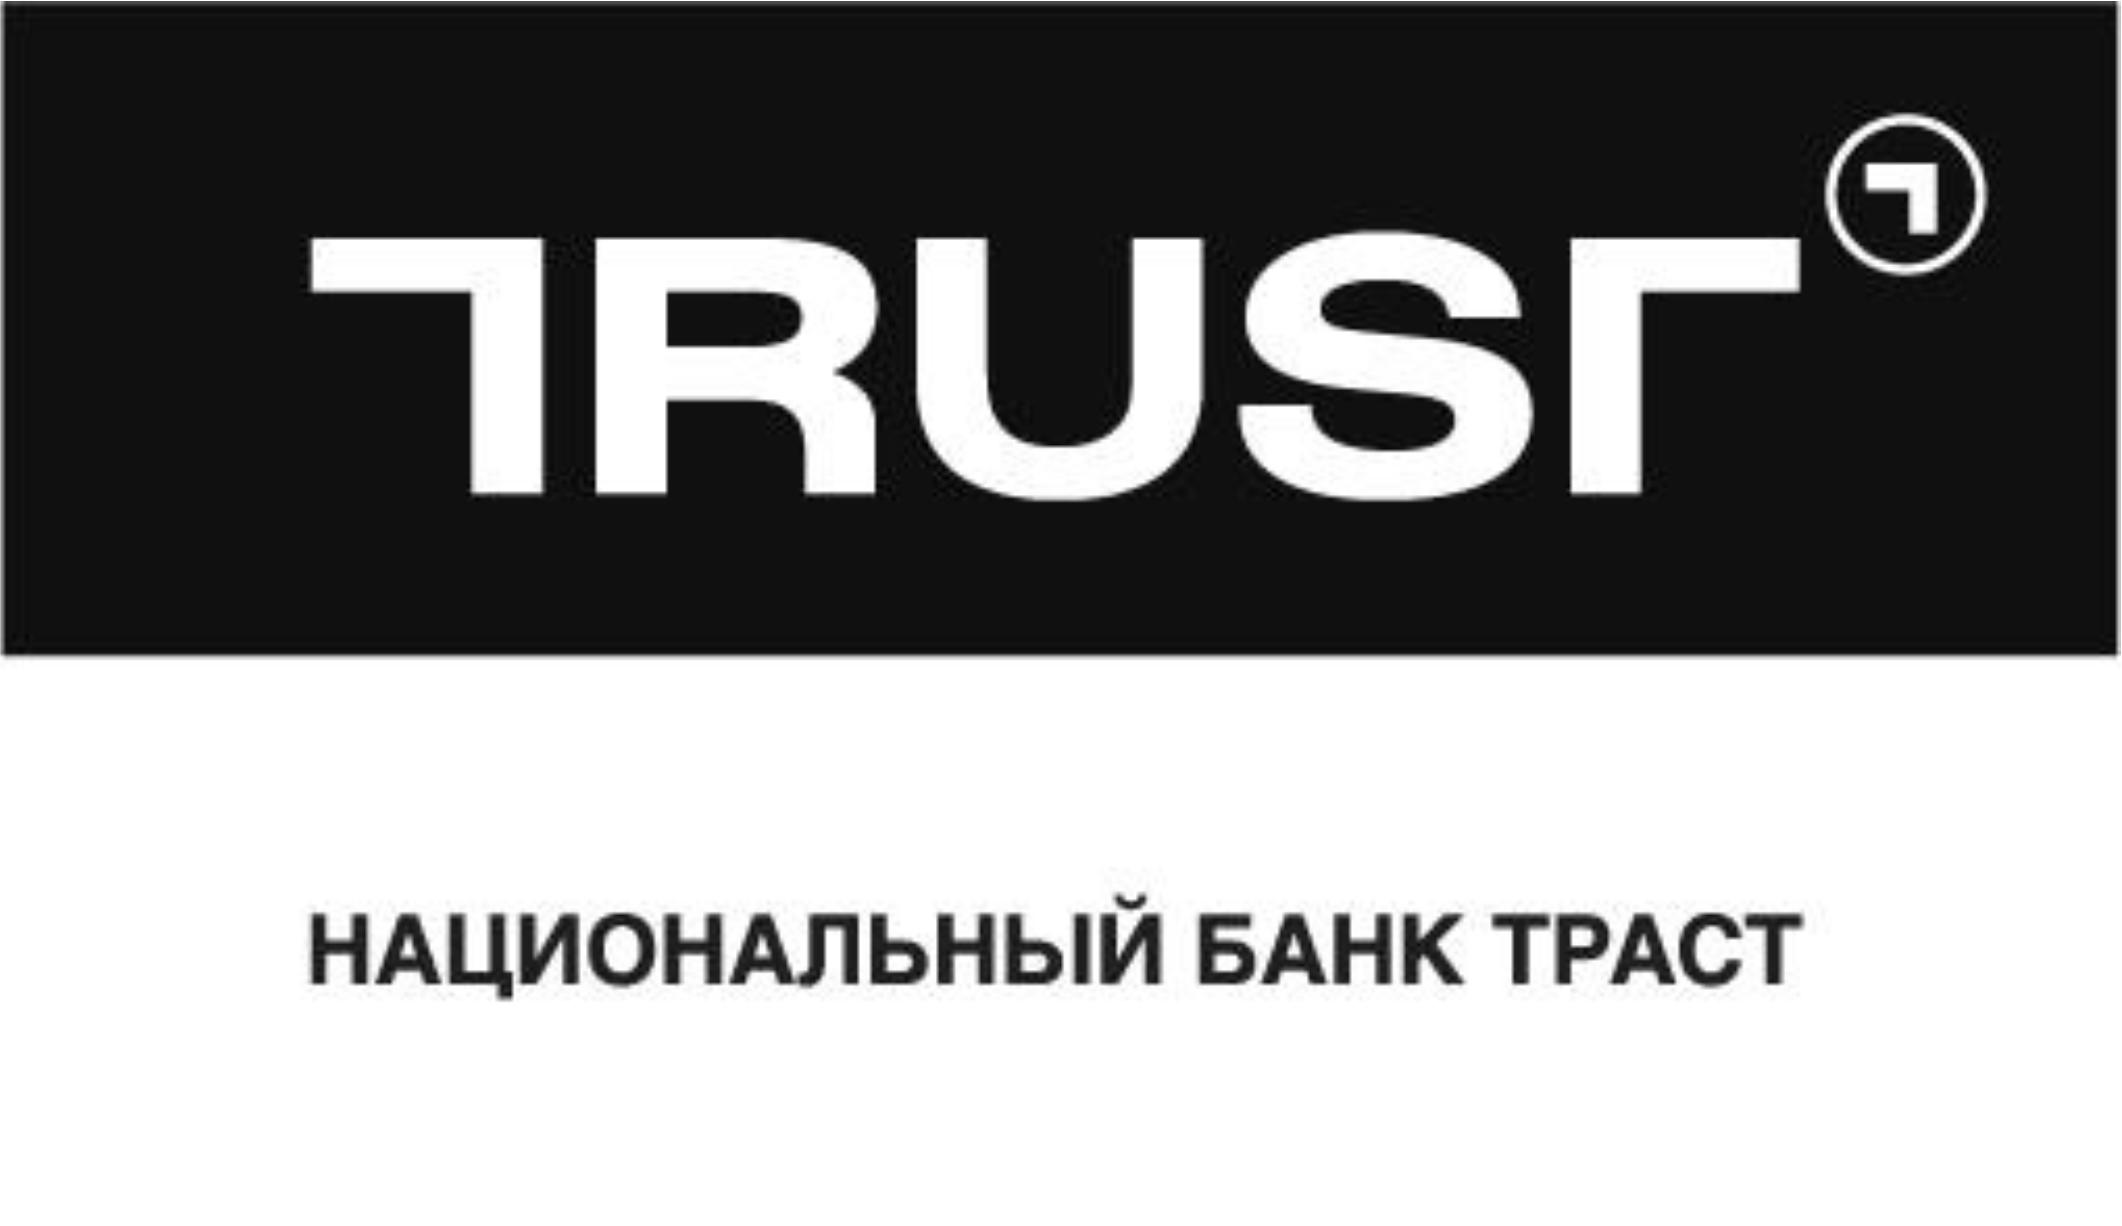 траст закроют или нет Республики Татарстан